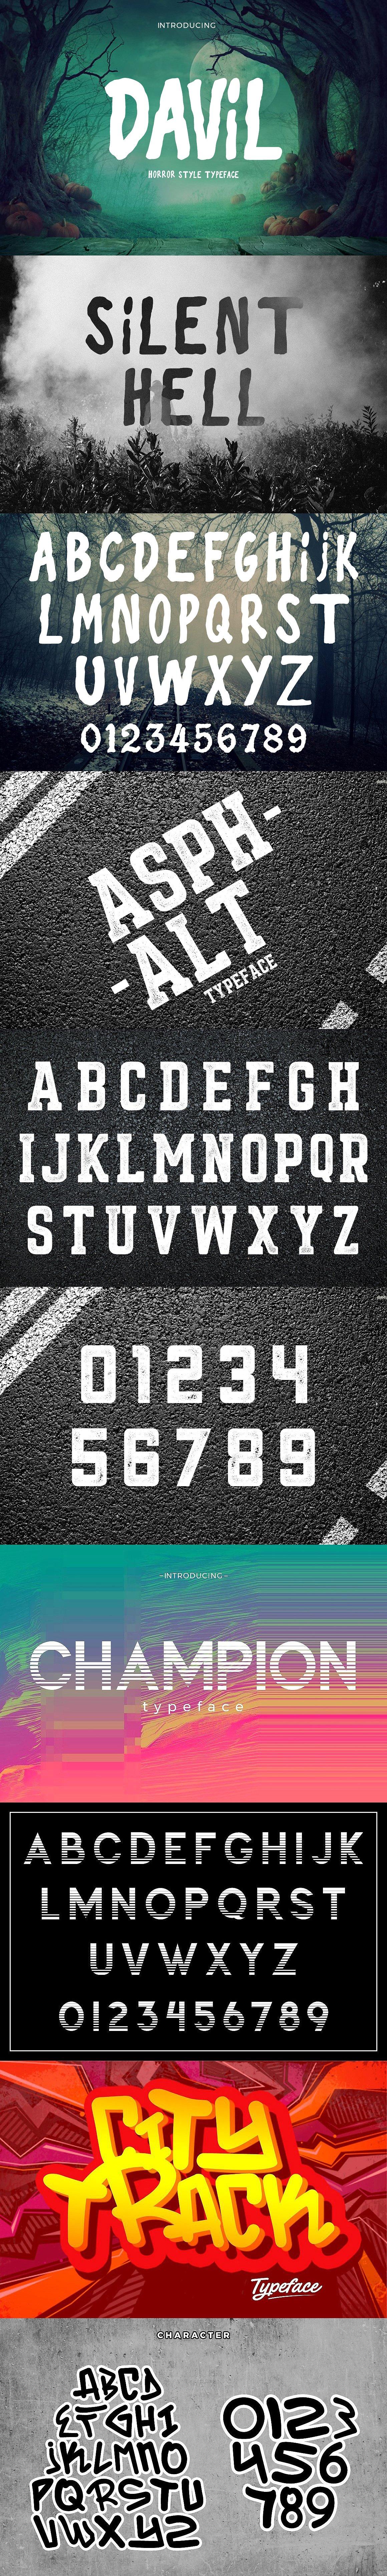 1597060175-66d3ec613410f78